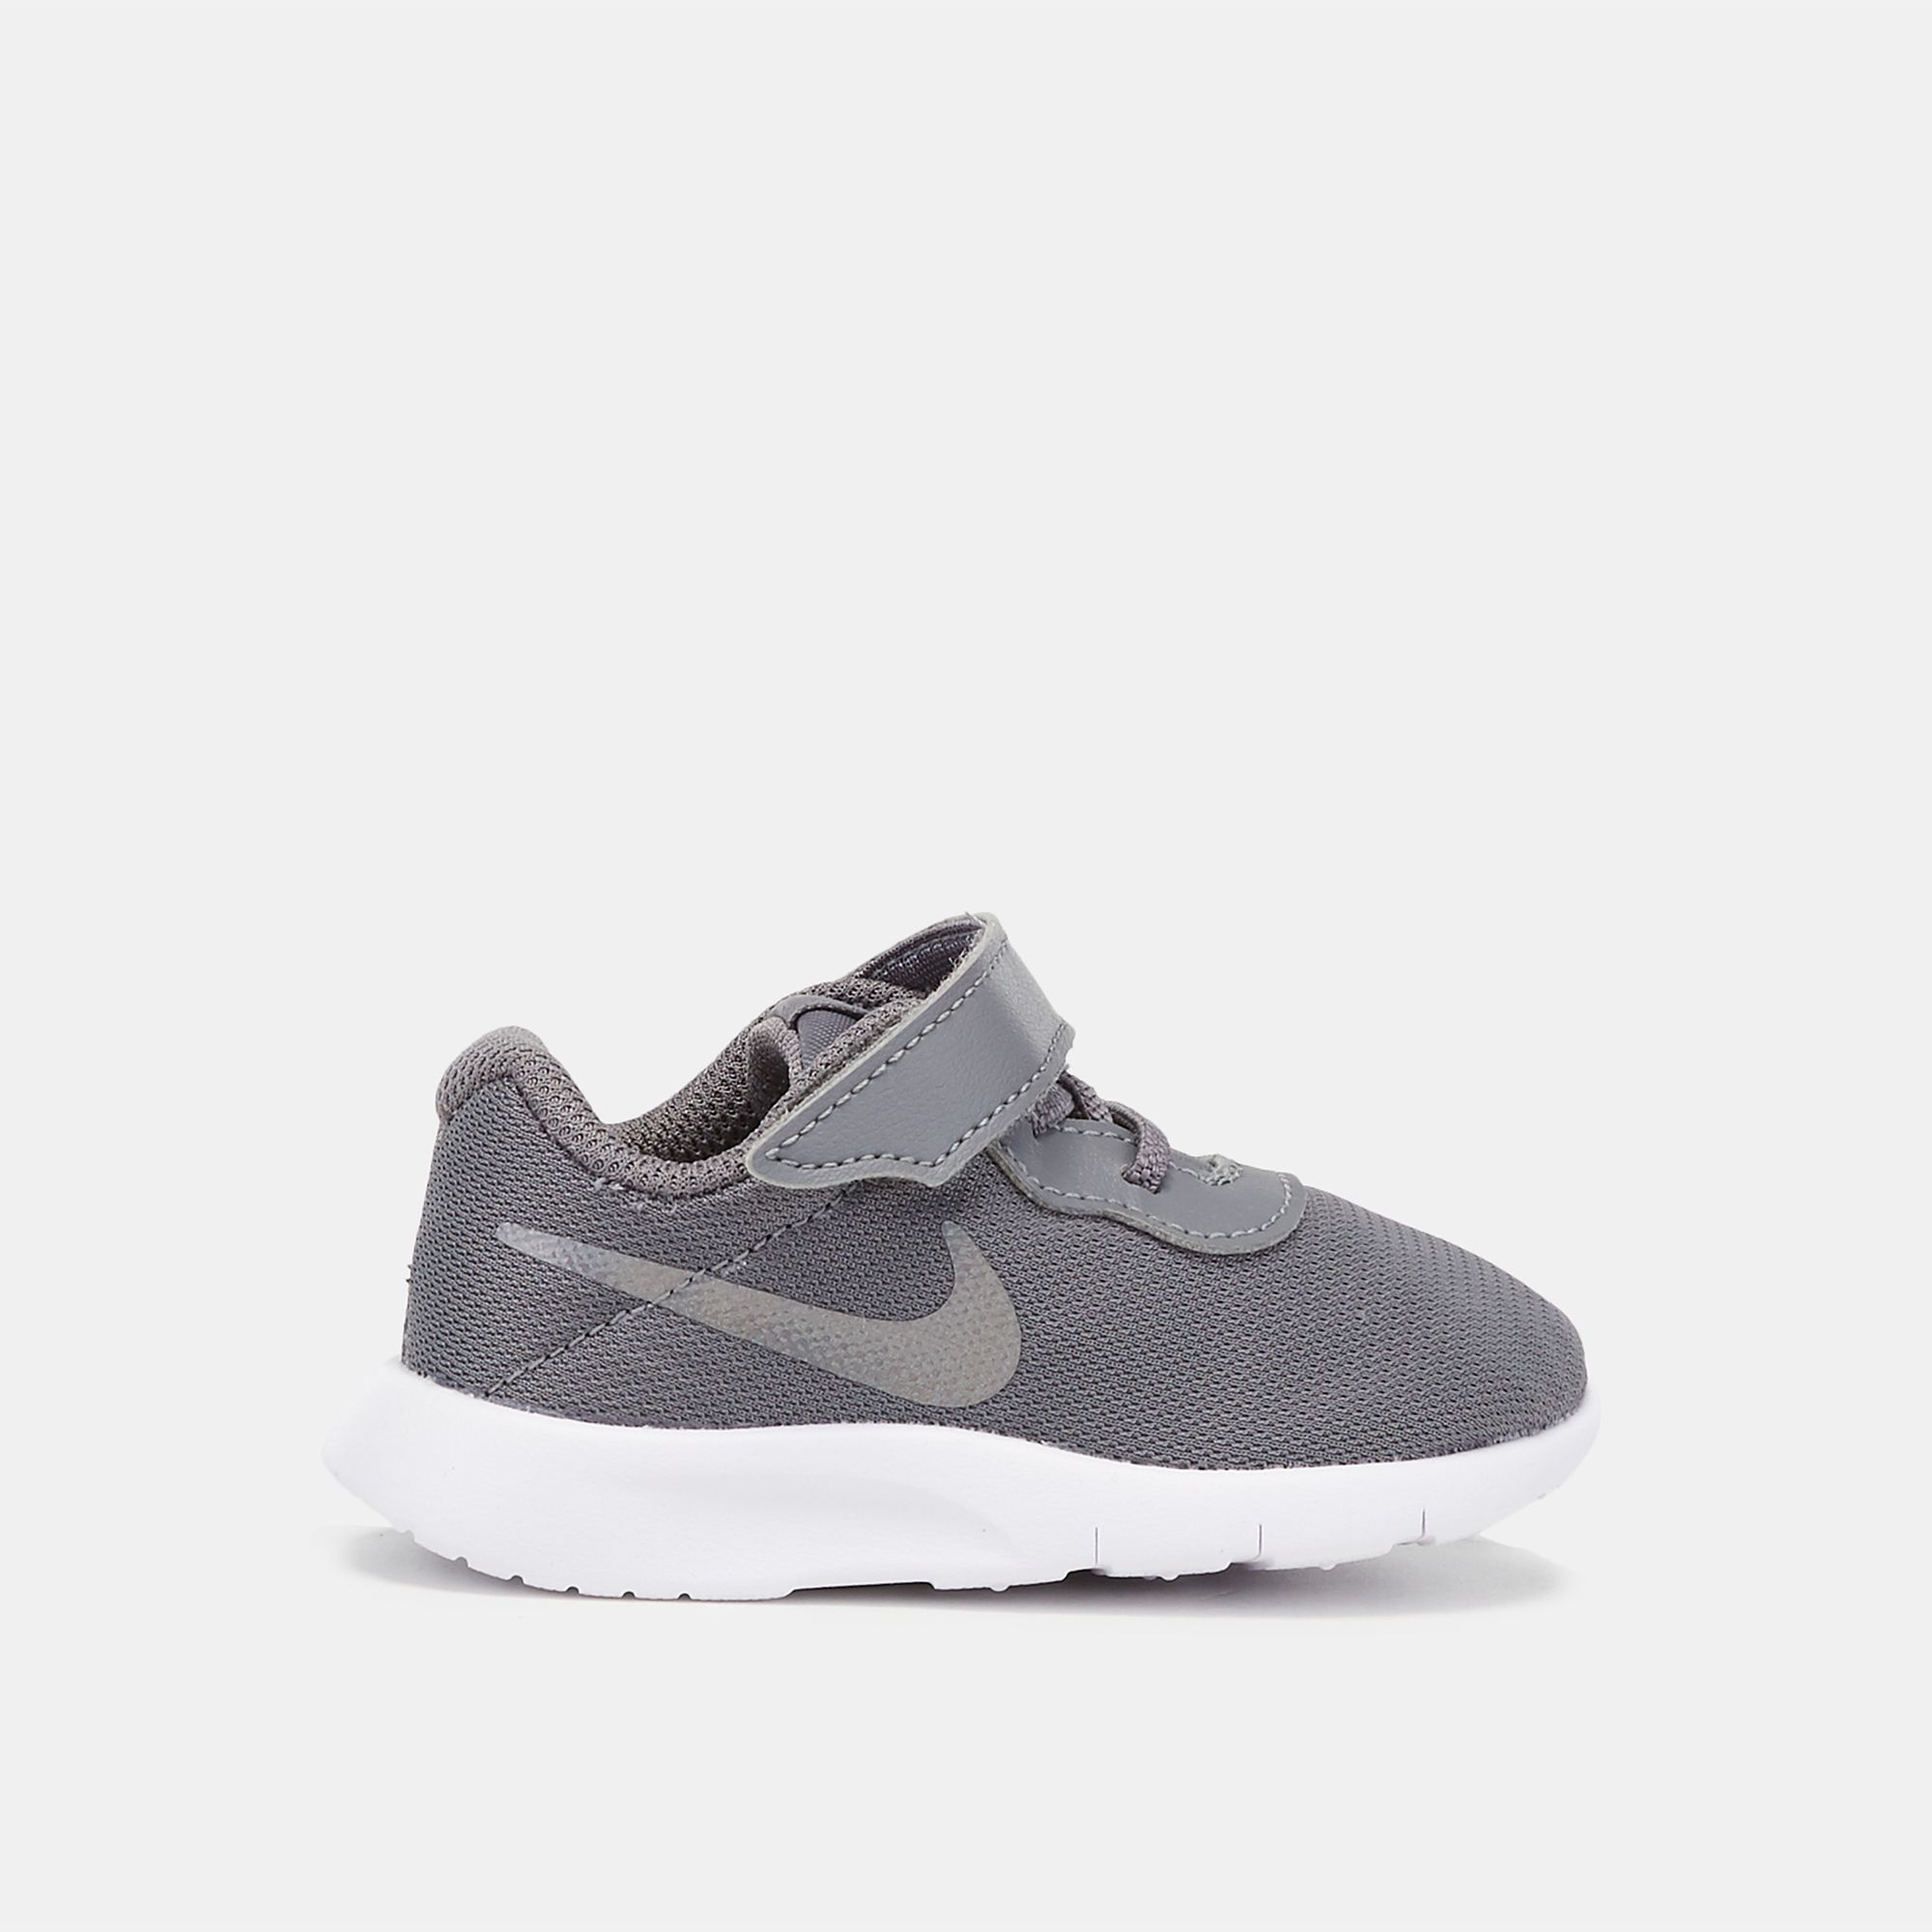 cheaper 11f6f 0b862 Shop Nike Kids  Tanjun Shoe (Toddler), Sneakers, Shoes, Sports ...